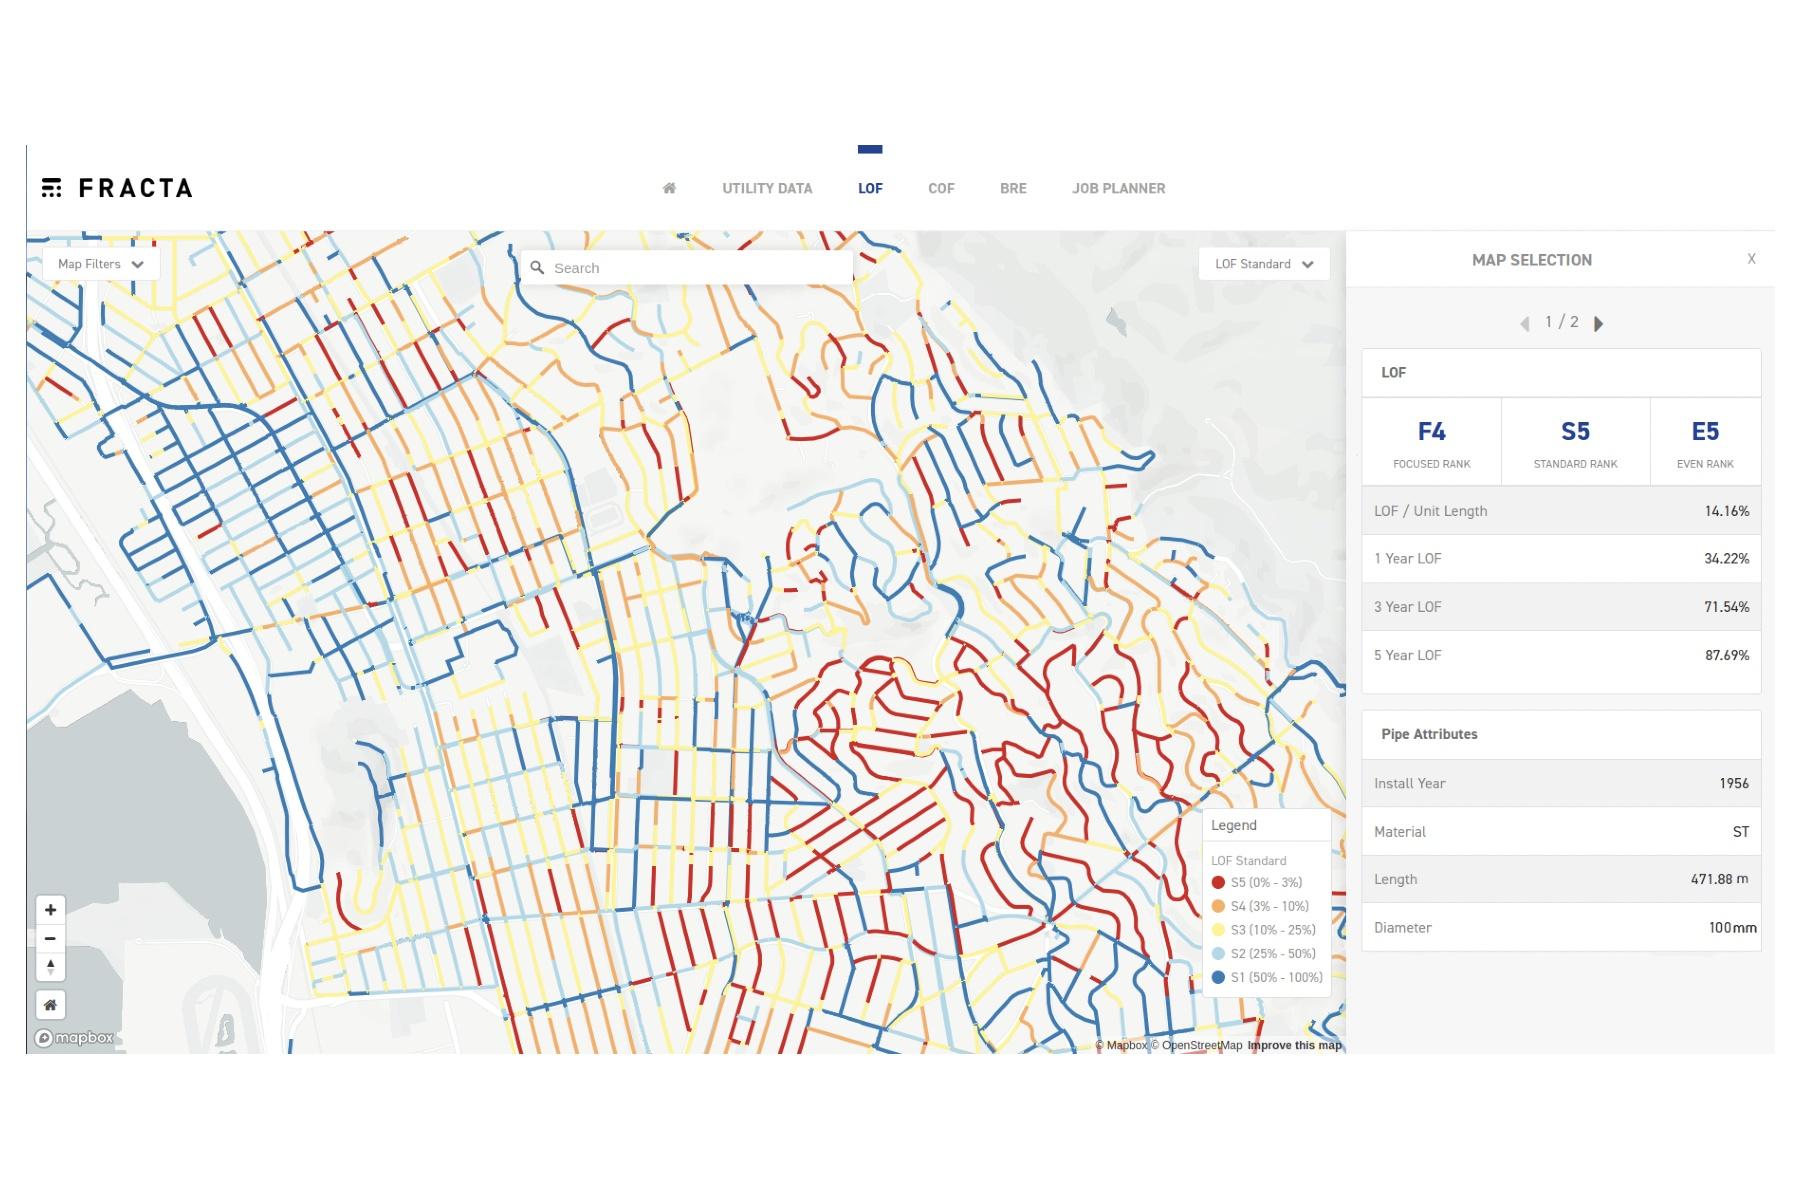 Fracta、AIを活用した水道管劣化予測技術を日本で初めて愛知県豊田市へ実践導入